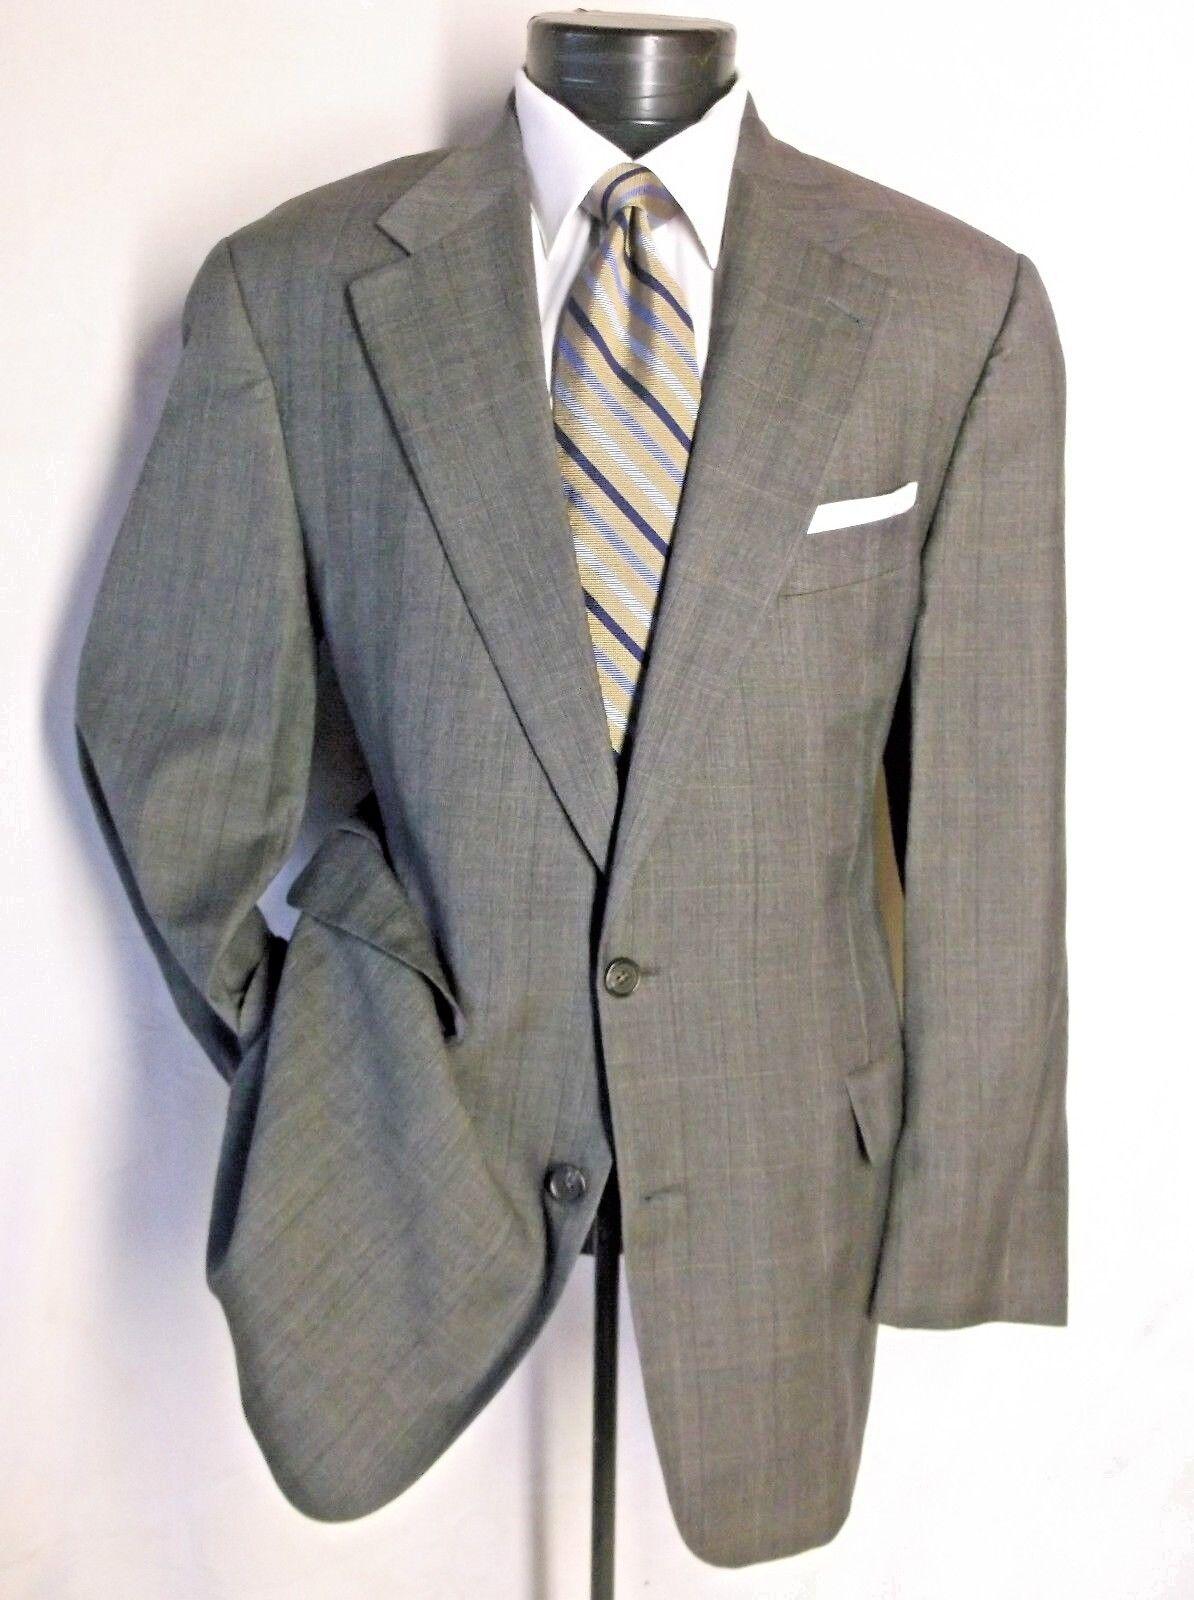 Brooks Brothers Suit 100% wool grau Braunish Plaid 2Button 41S Pant W 36